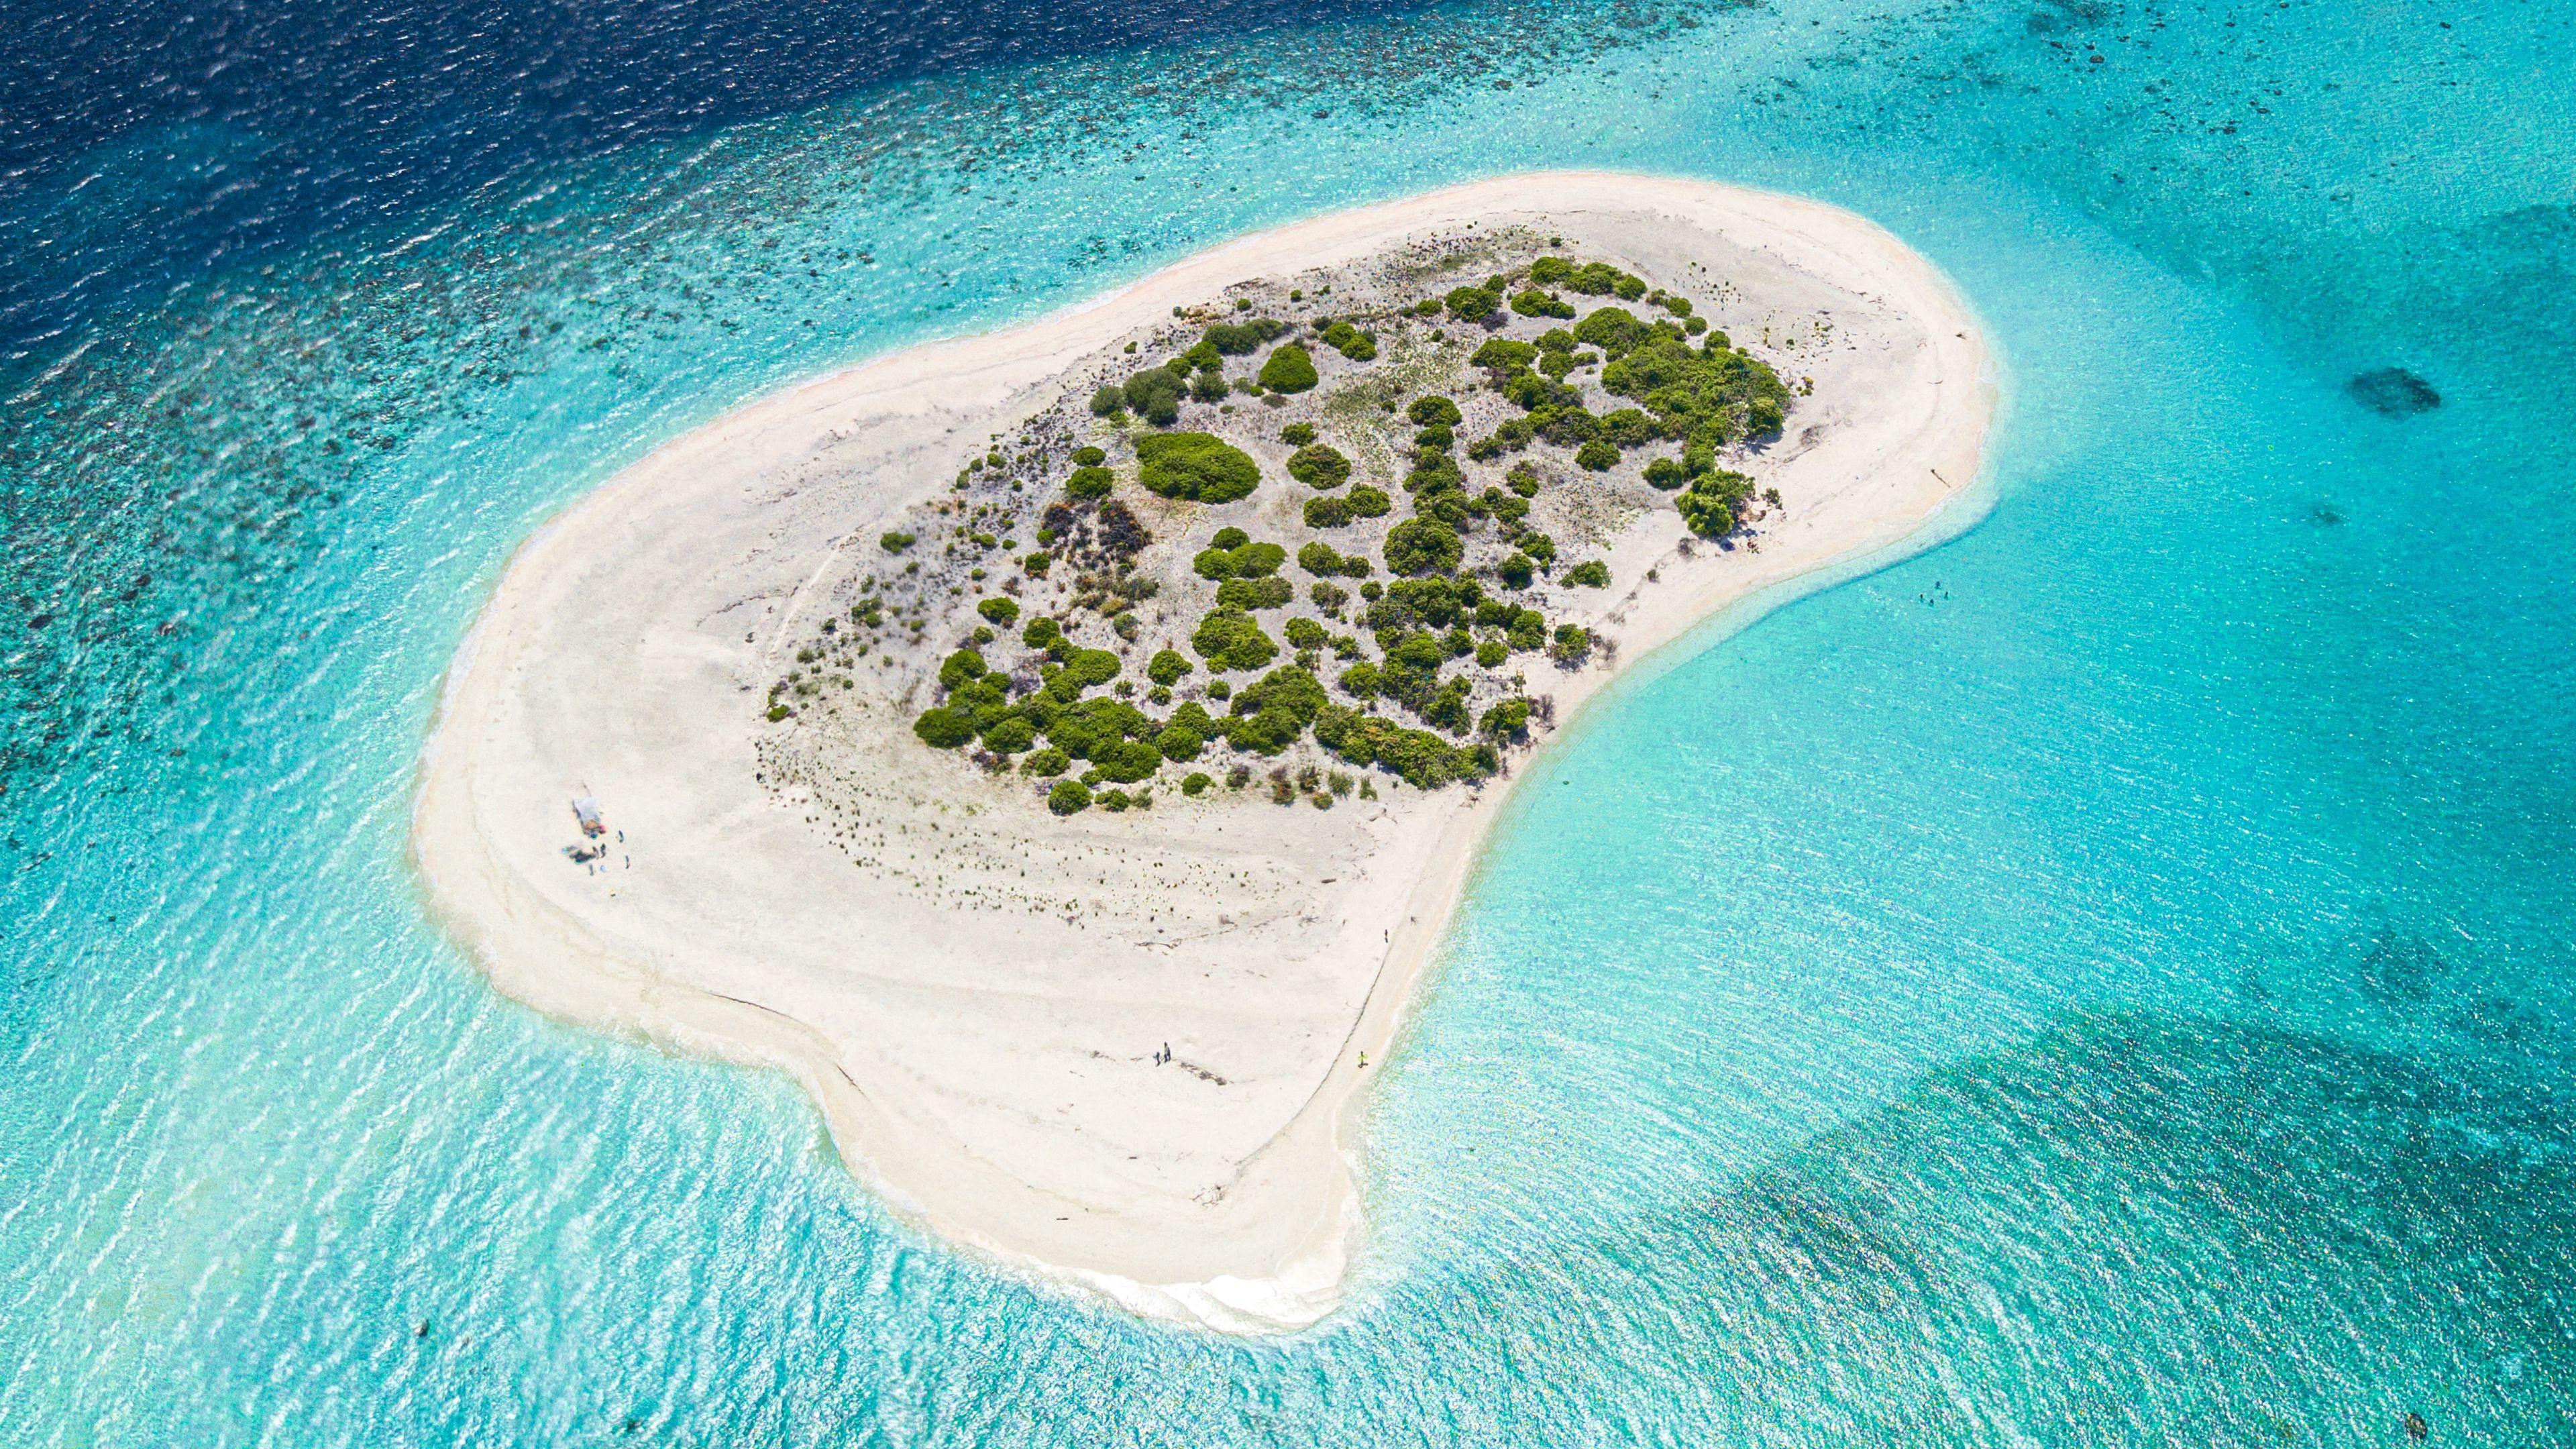 Download wallpaper 3840x2160 island ocean aerial view water 3840x2160